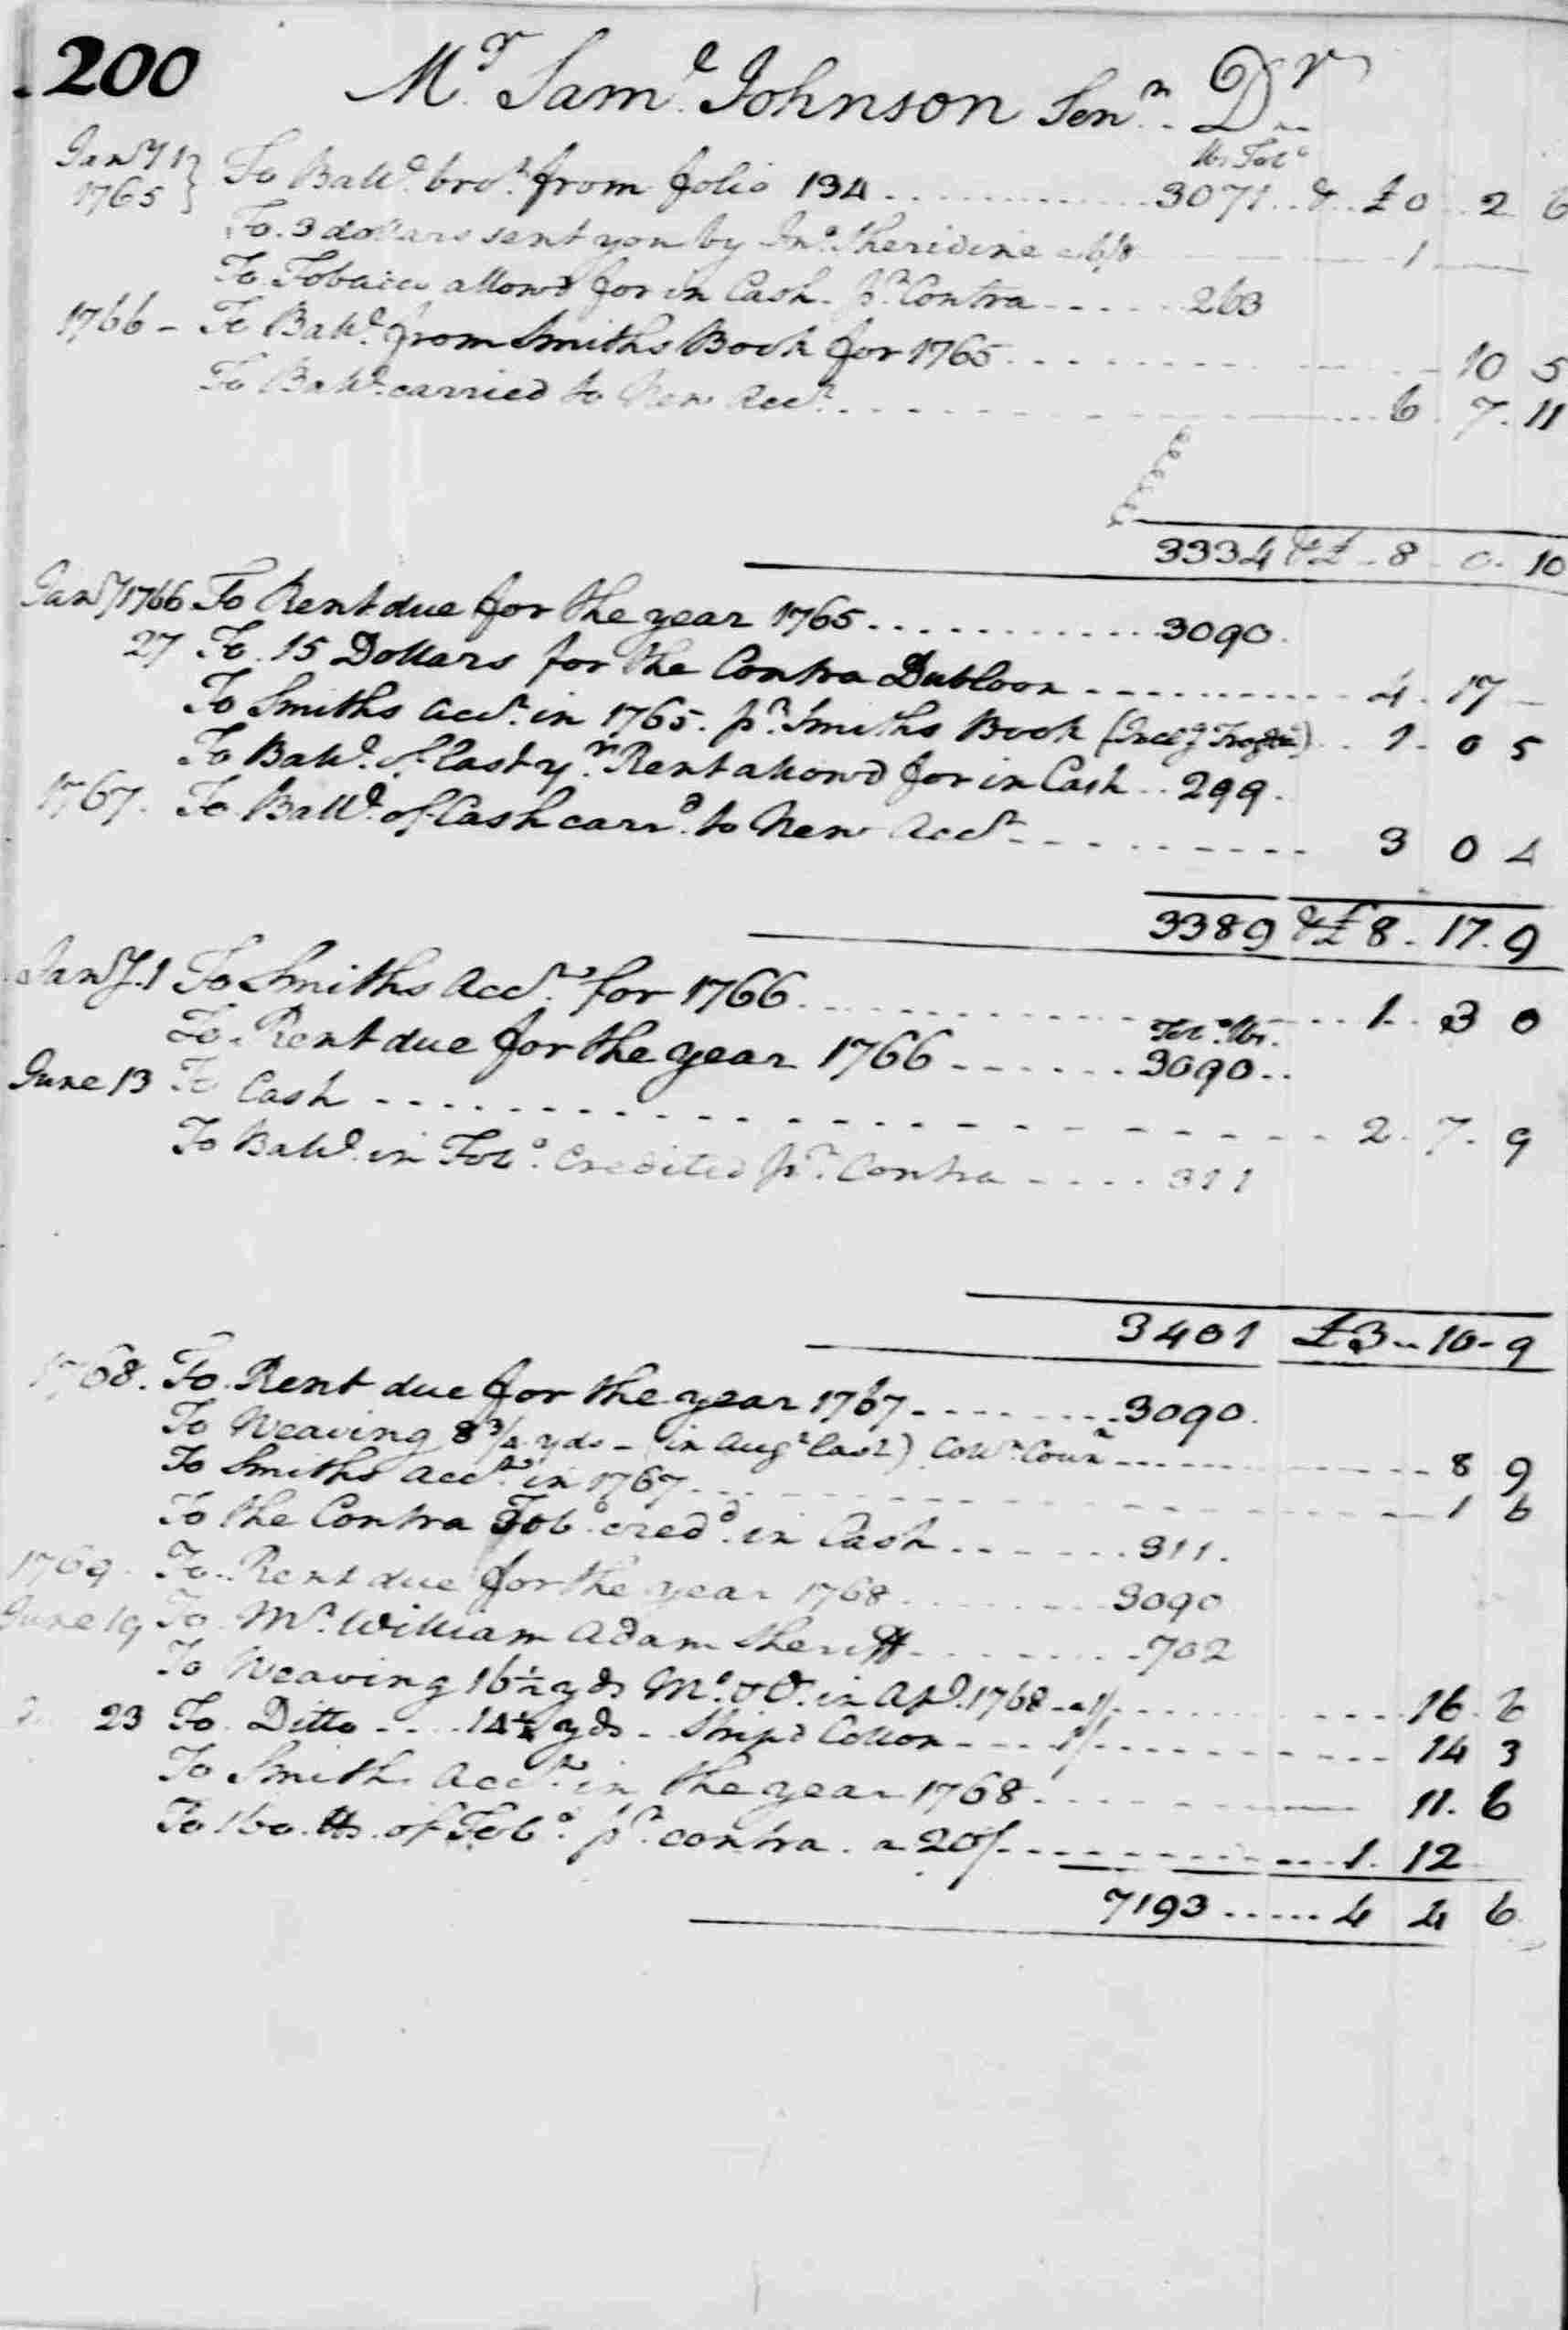 Ledger A, folio 200, left side